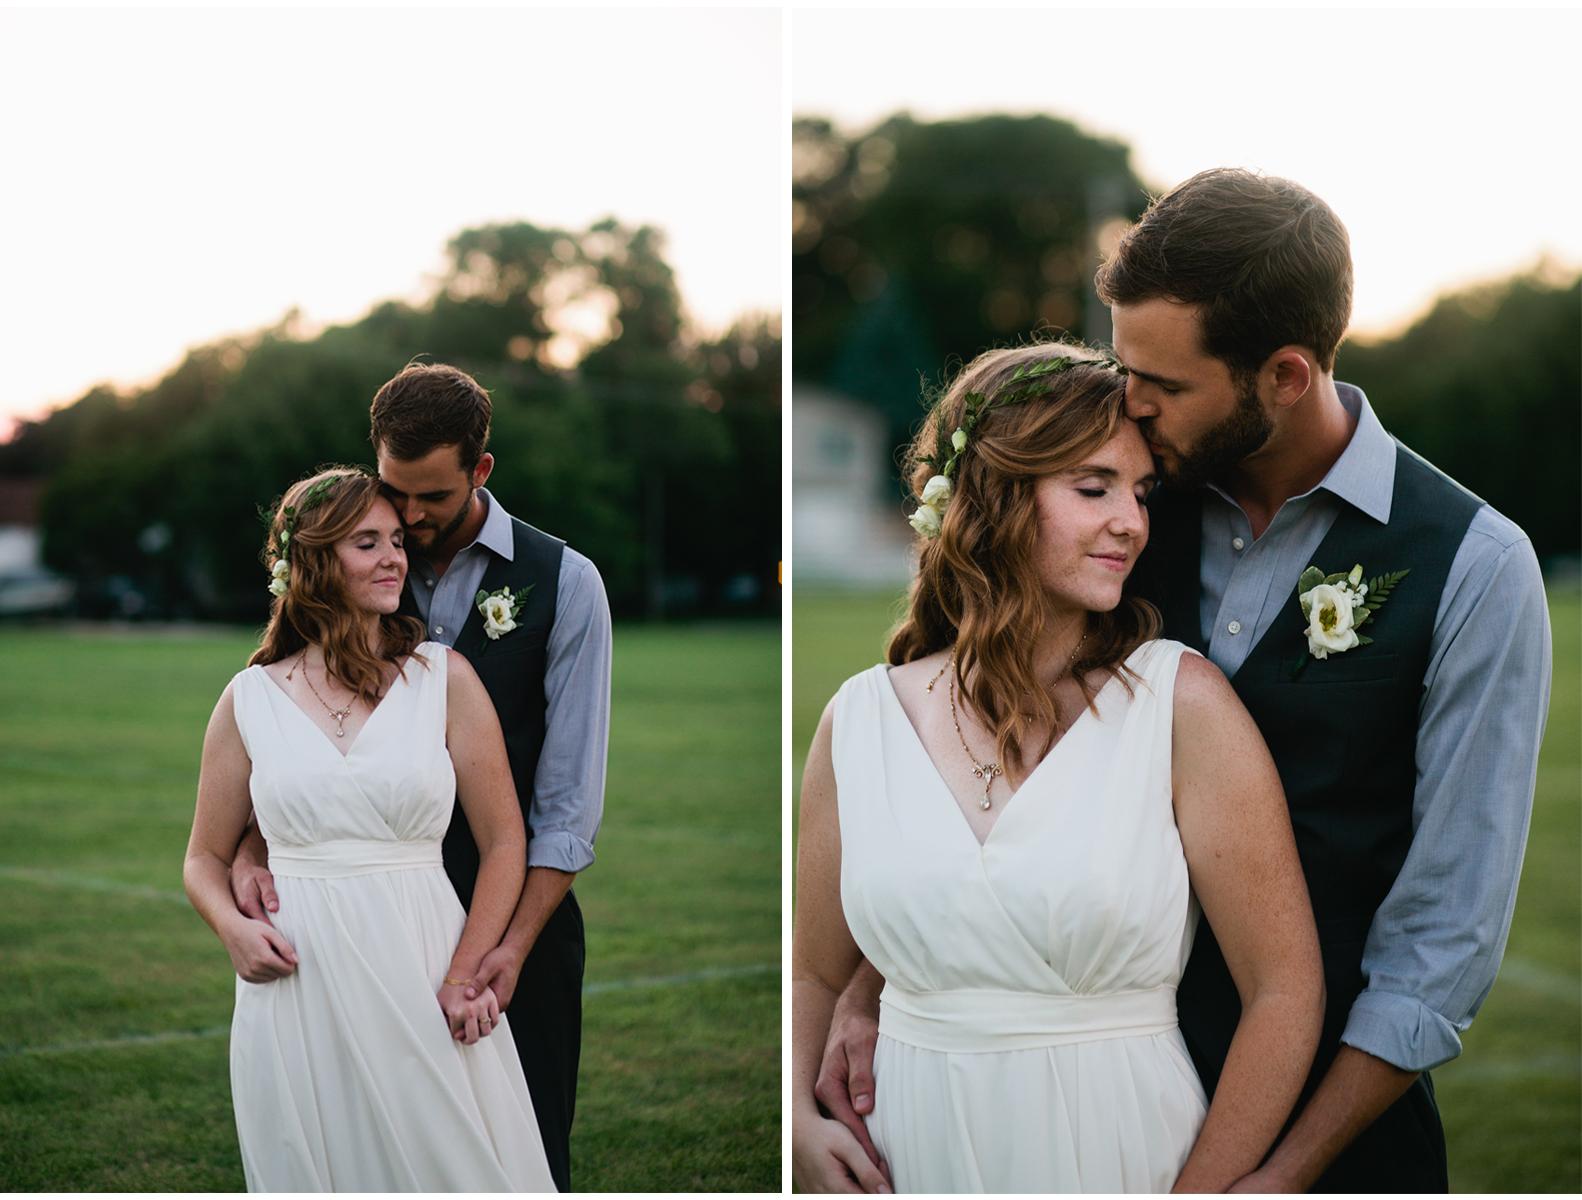 ames_wedding_photos07.jpg